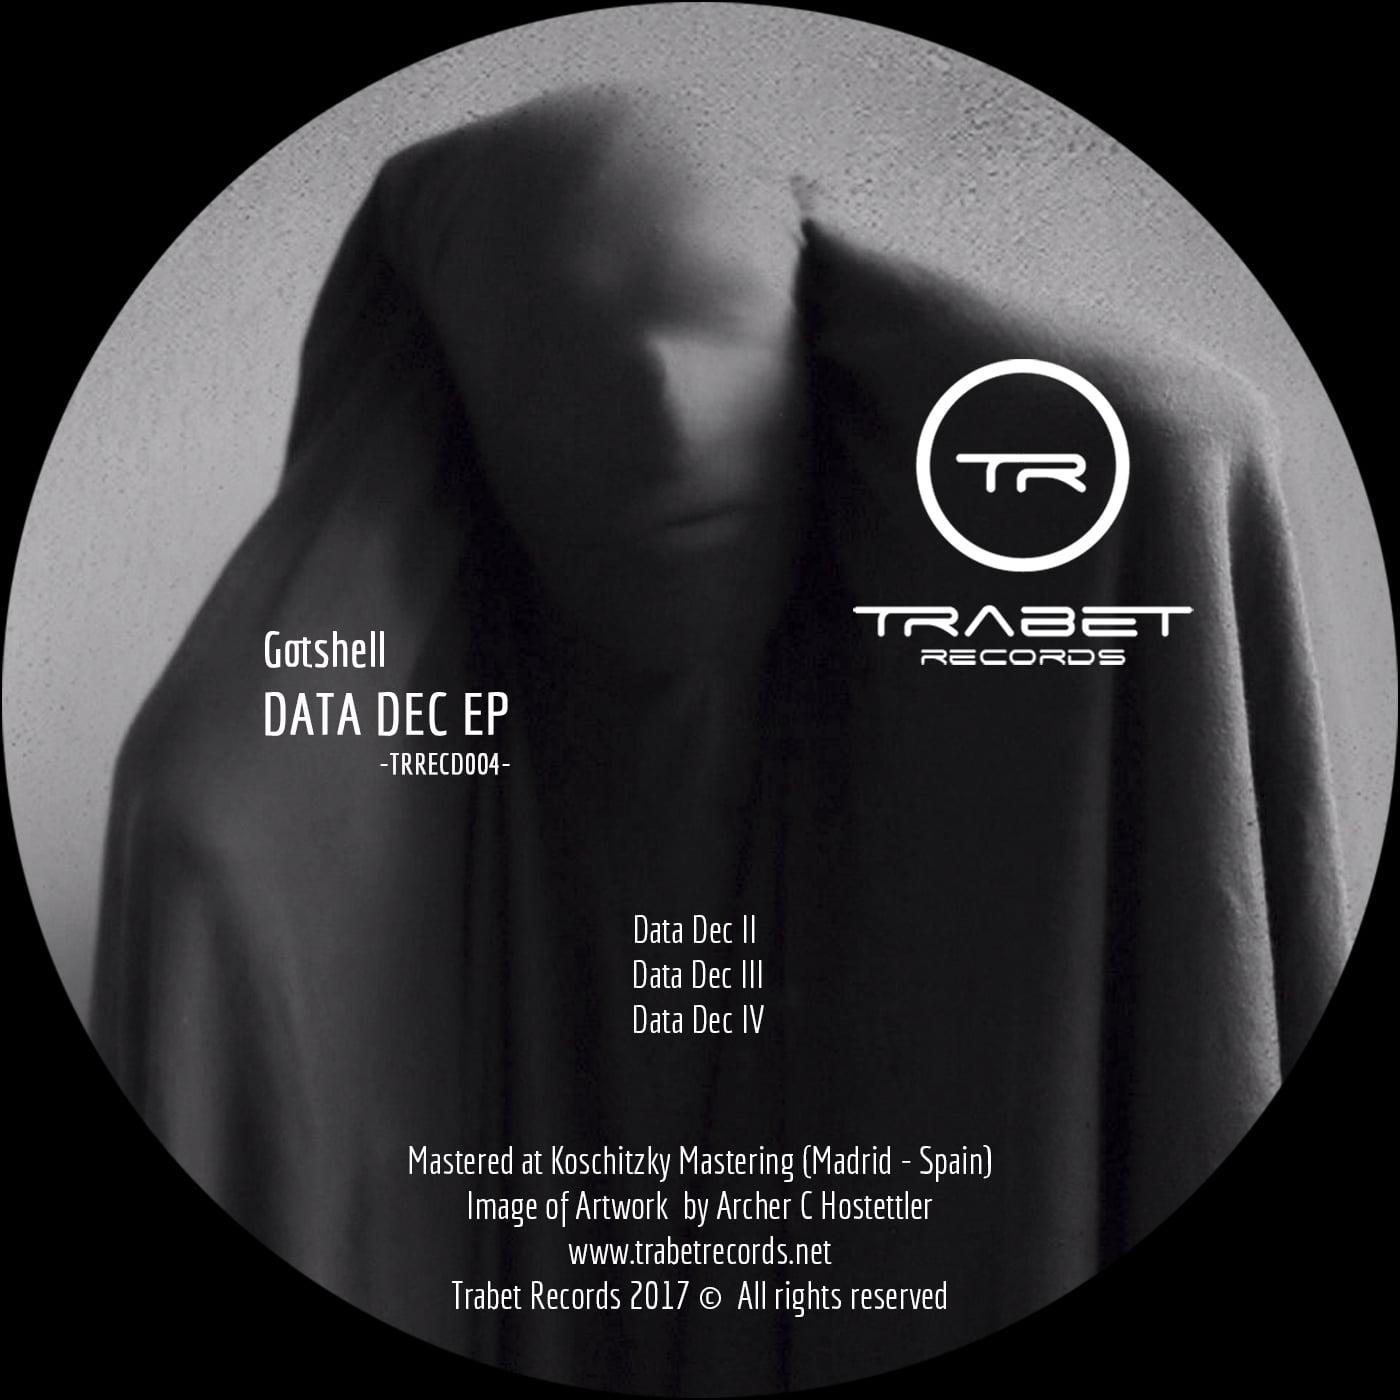 Freedom 2017: Gotshell debuta en Trabet Records